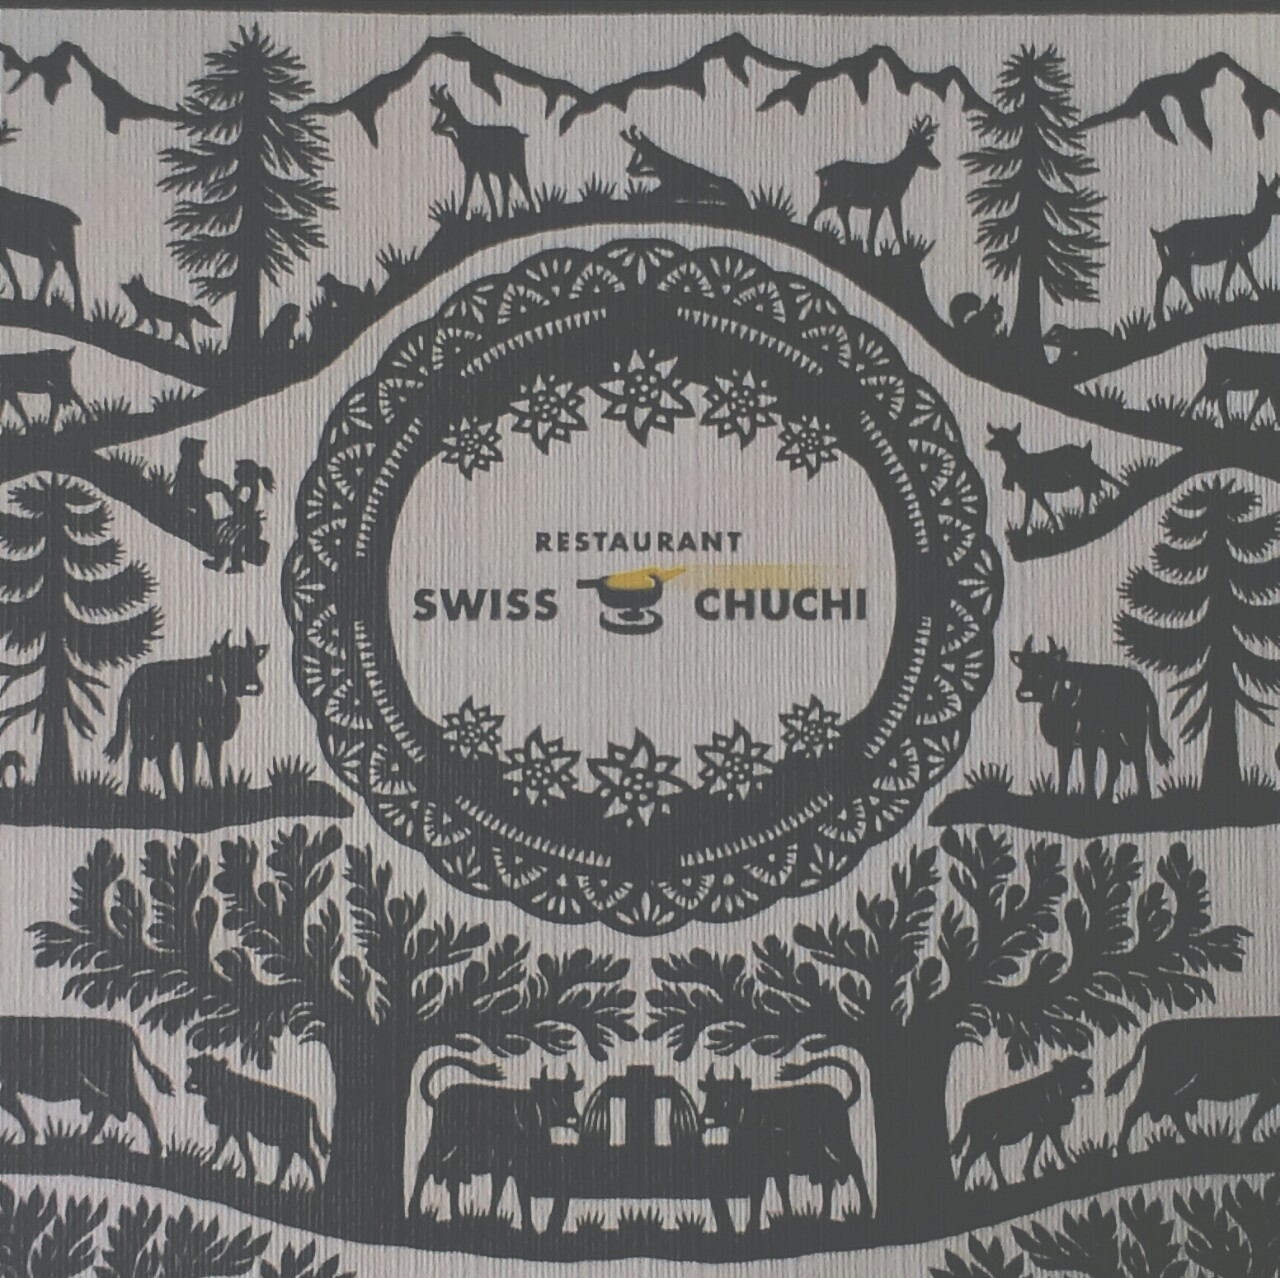 Swiss Chuchi